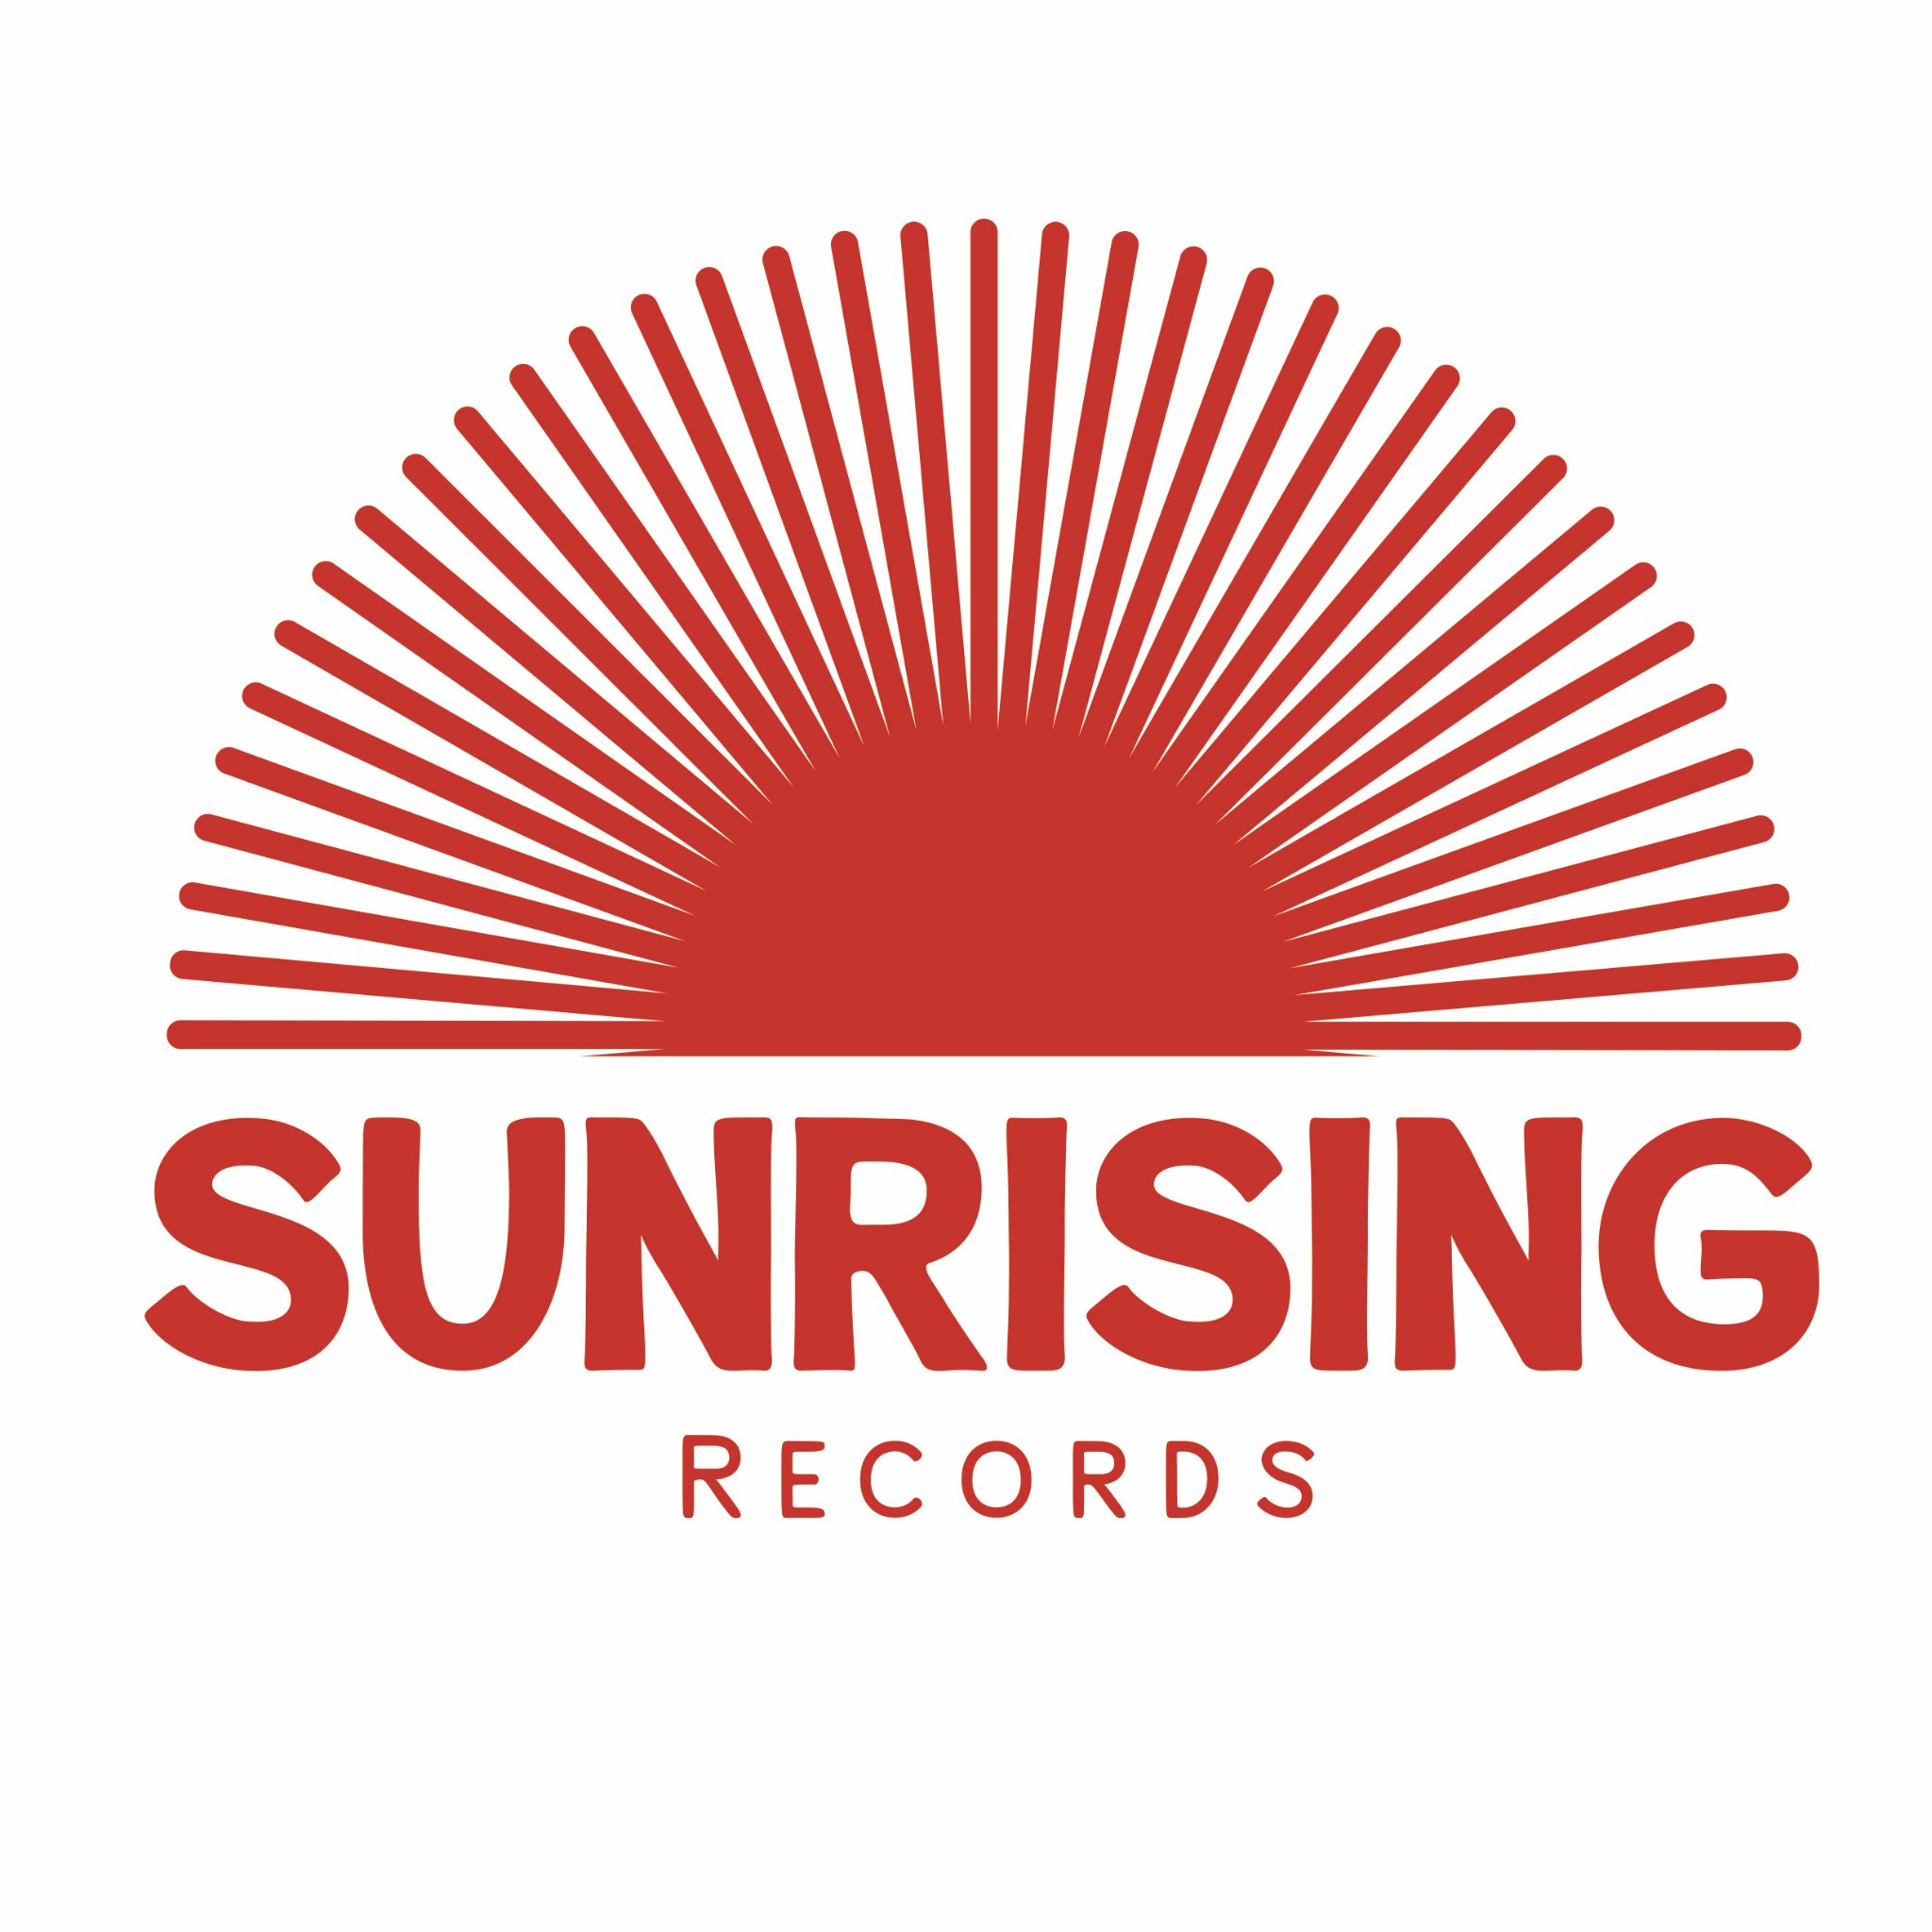 sunrisingrecords